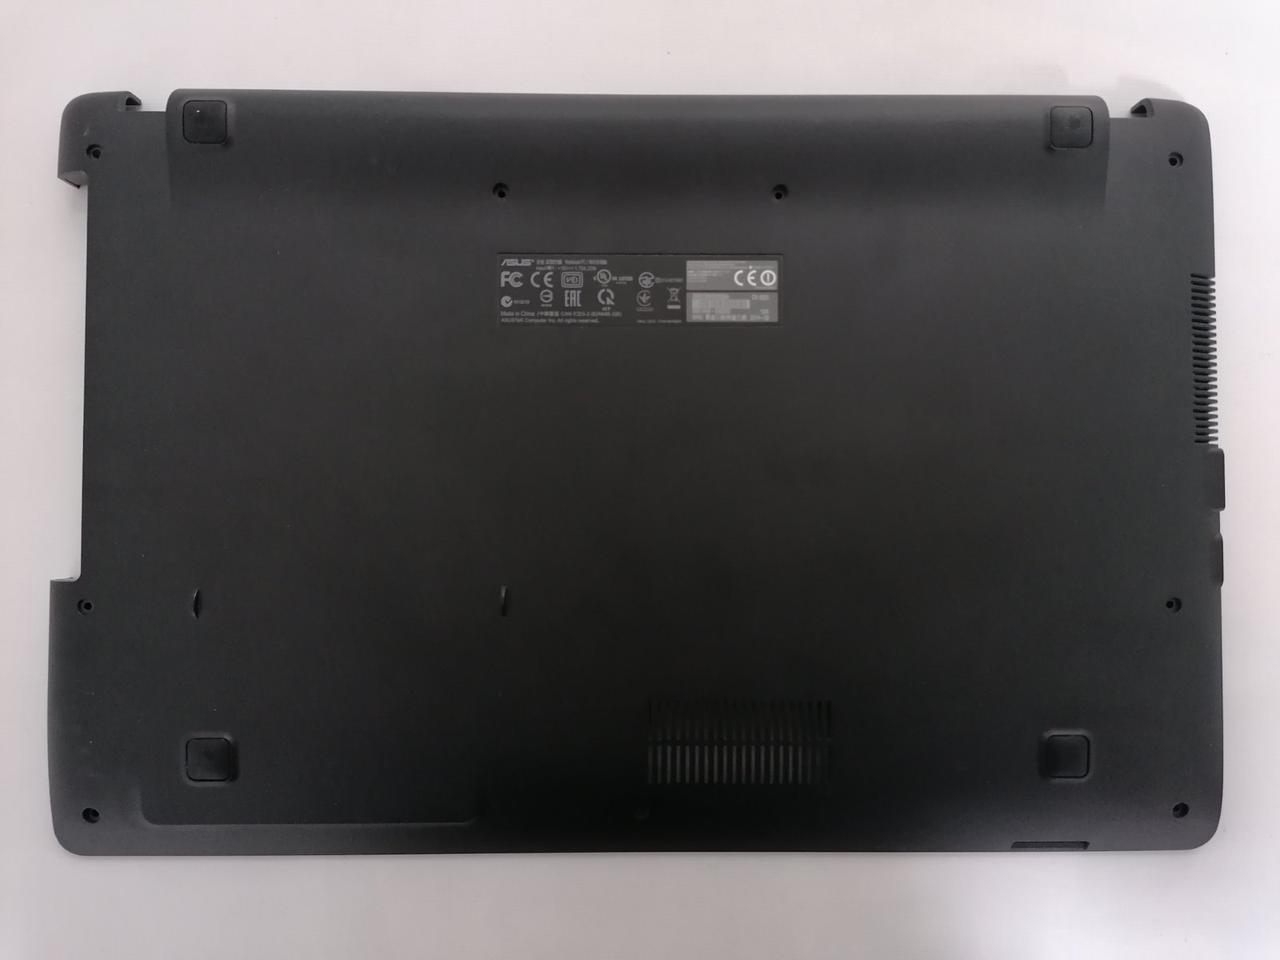 Б/У корпус поддон (низ) для ASUS X551 X551M X551MA X551C X551CA F551 R512 Series - 13NB0341AP0431